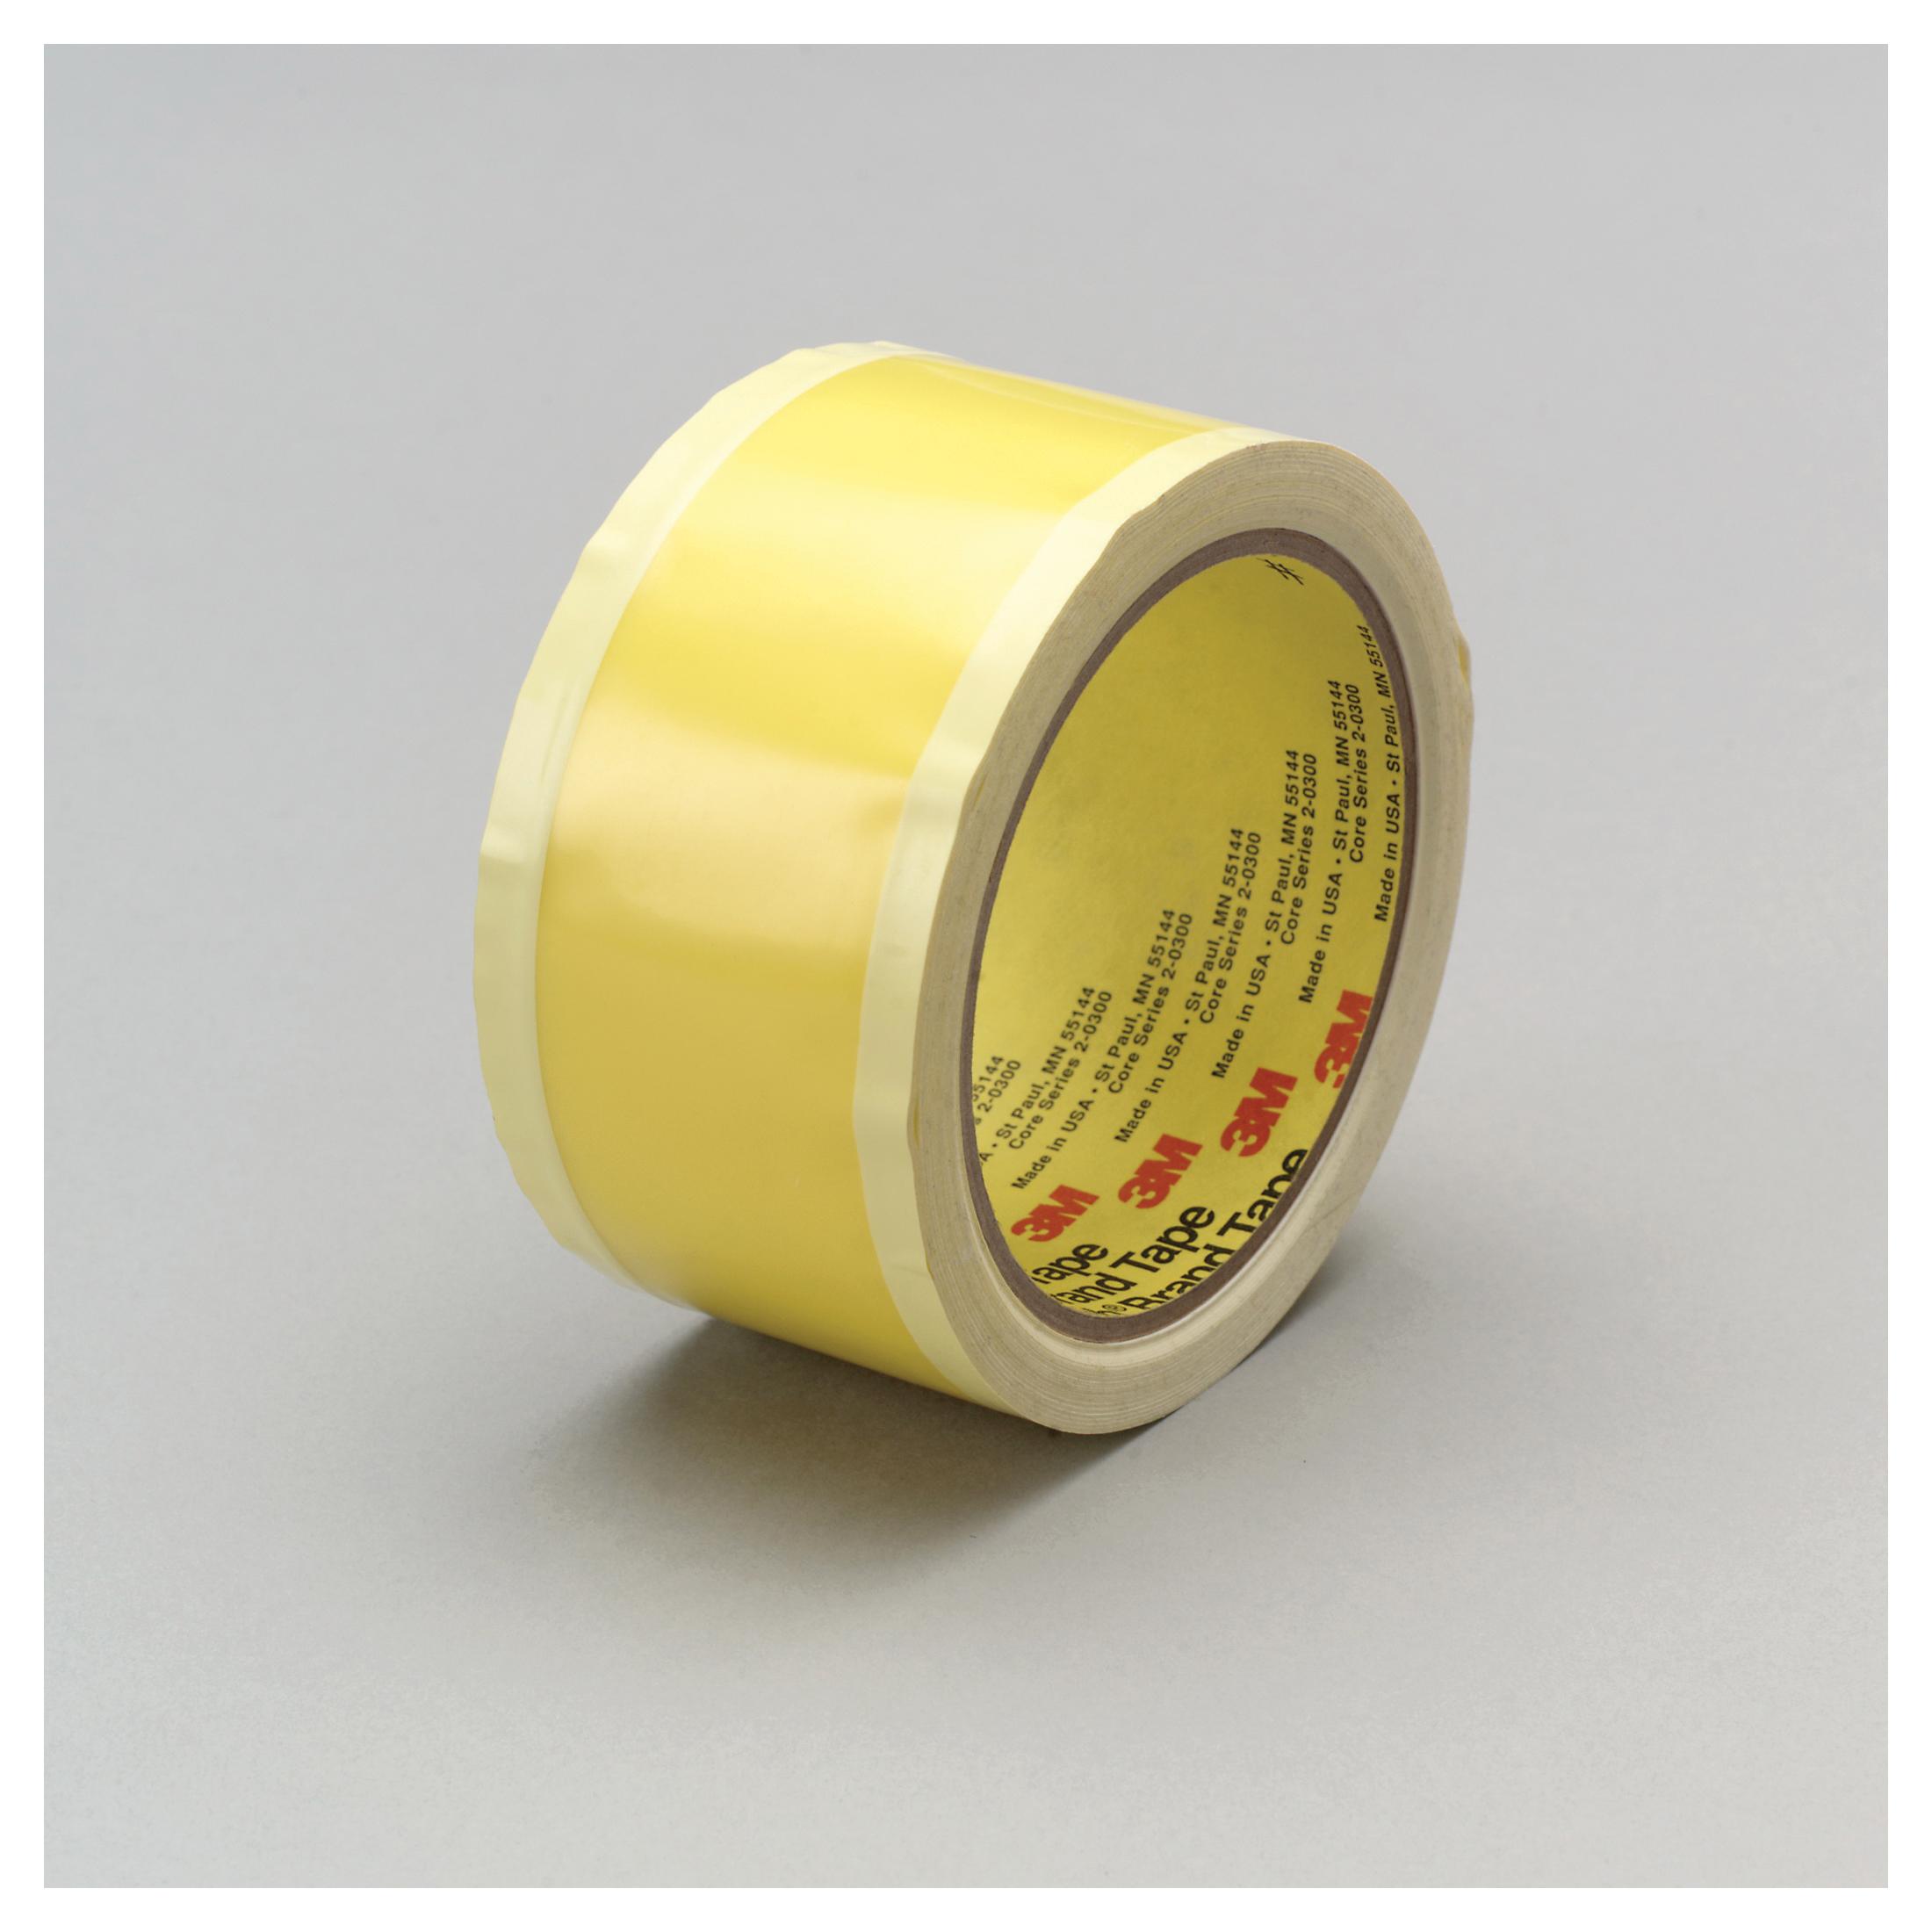 3M™ 021200-67948 General Purpose Riveters Film Tape, 36 yd L x 2 in W, 3 mil THK, Acrylic Adhesive, 2 mil Polyethylene Backing, Yellow